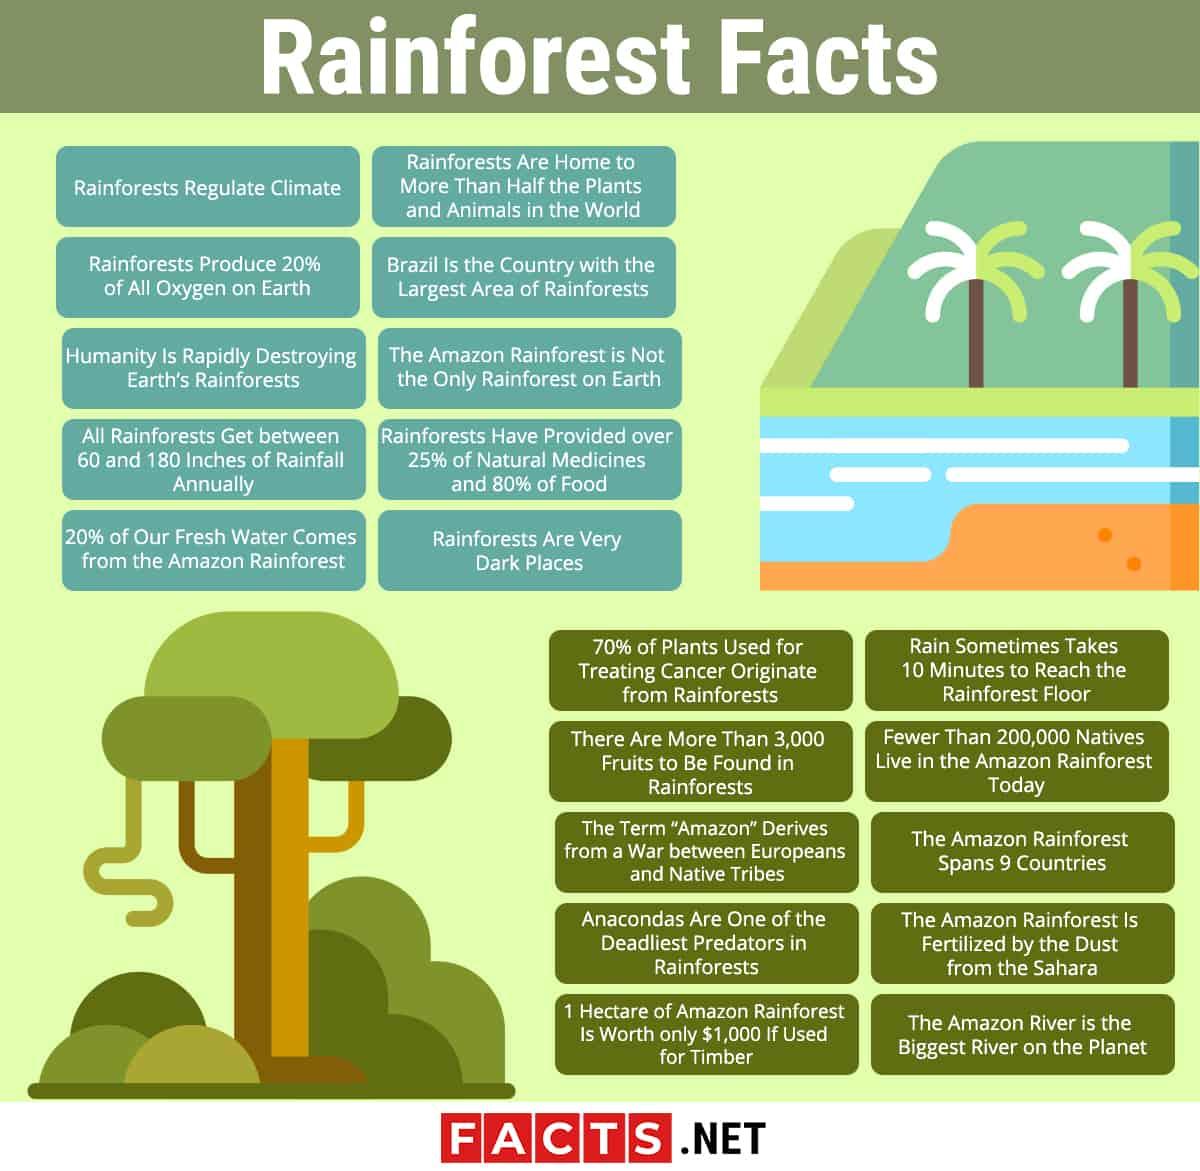 20 Rainforest Facts